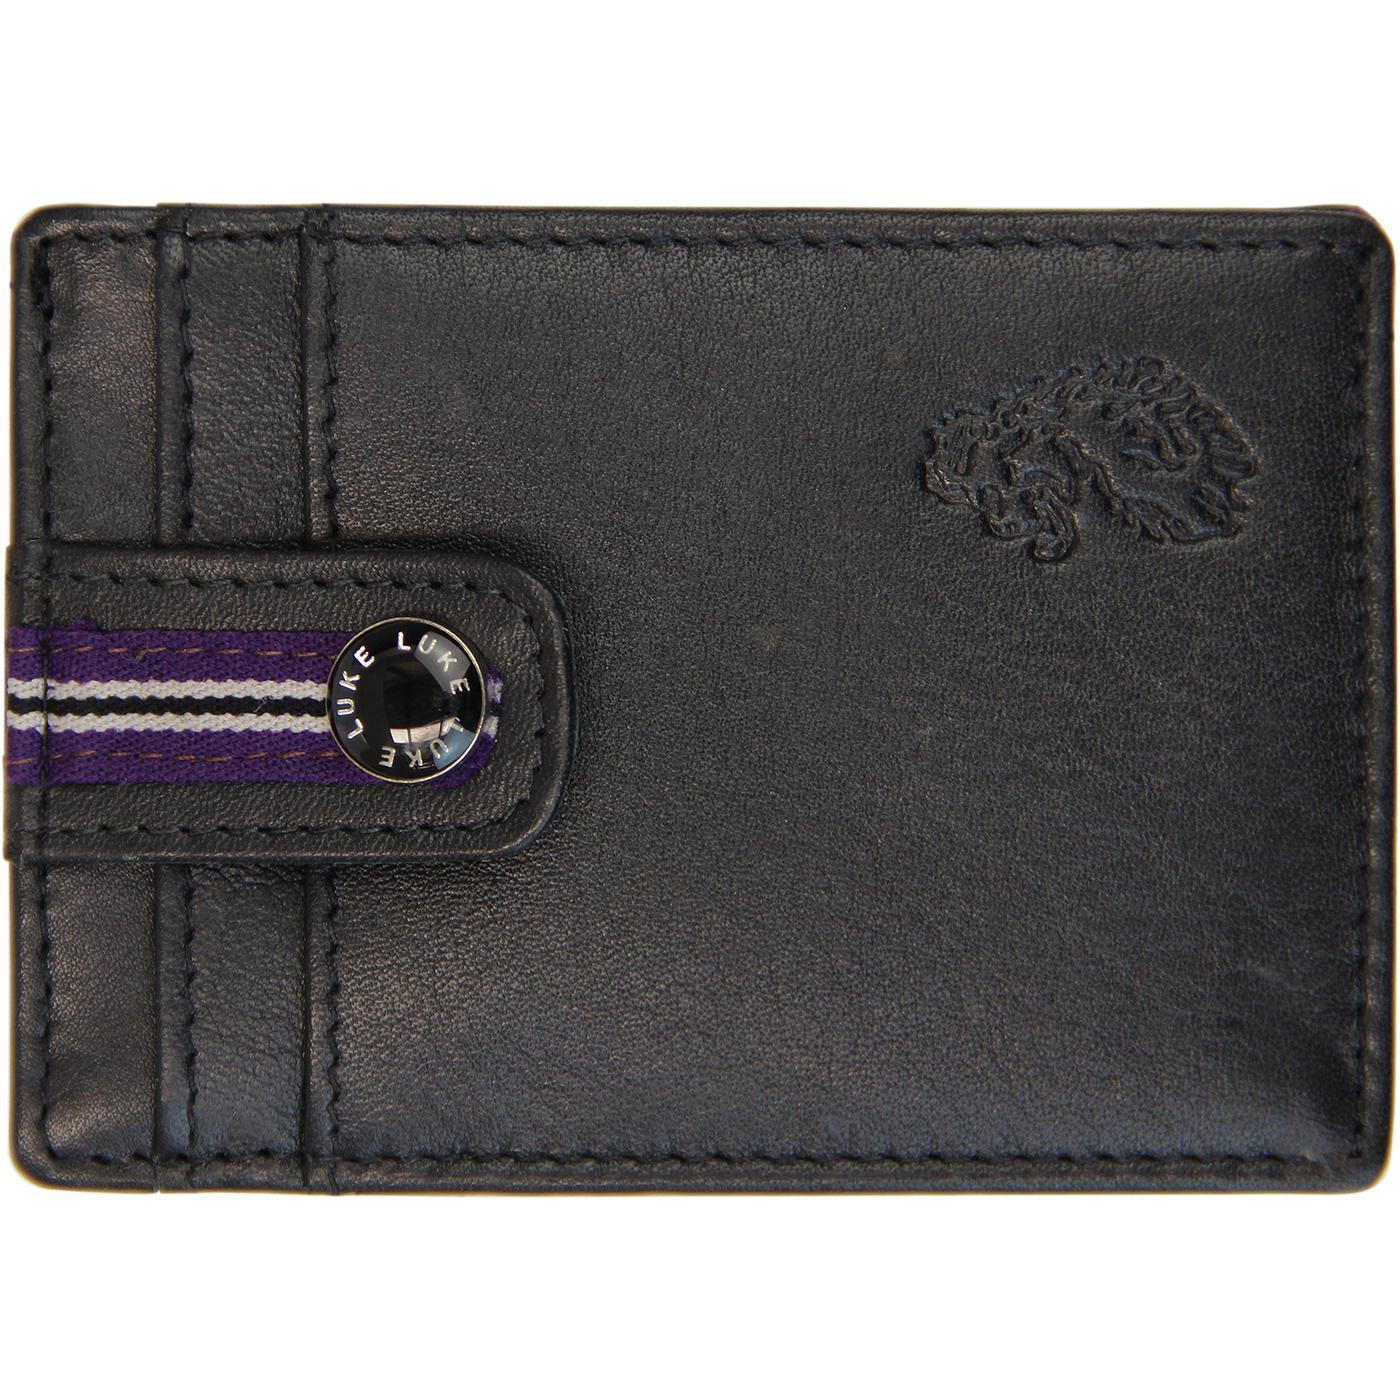 Kem LUKE Retro Tape Trim Leather Card Holder BLACK